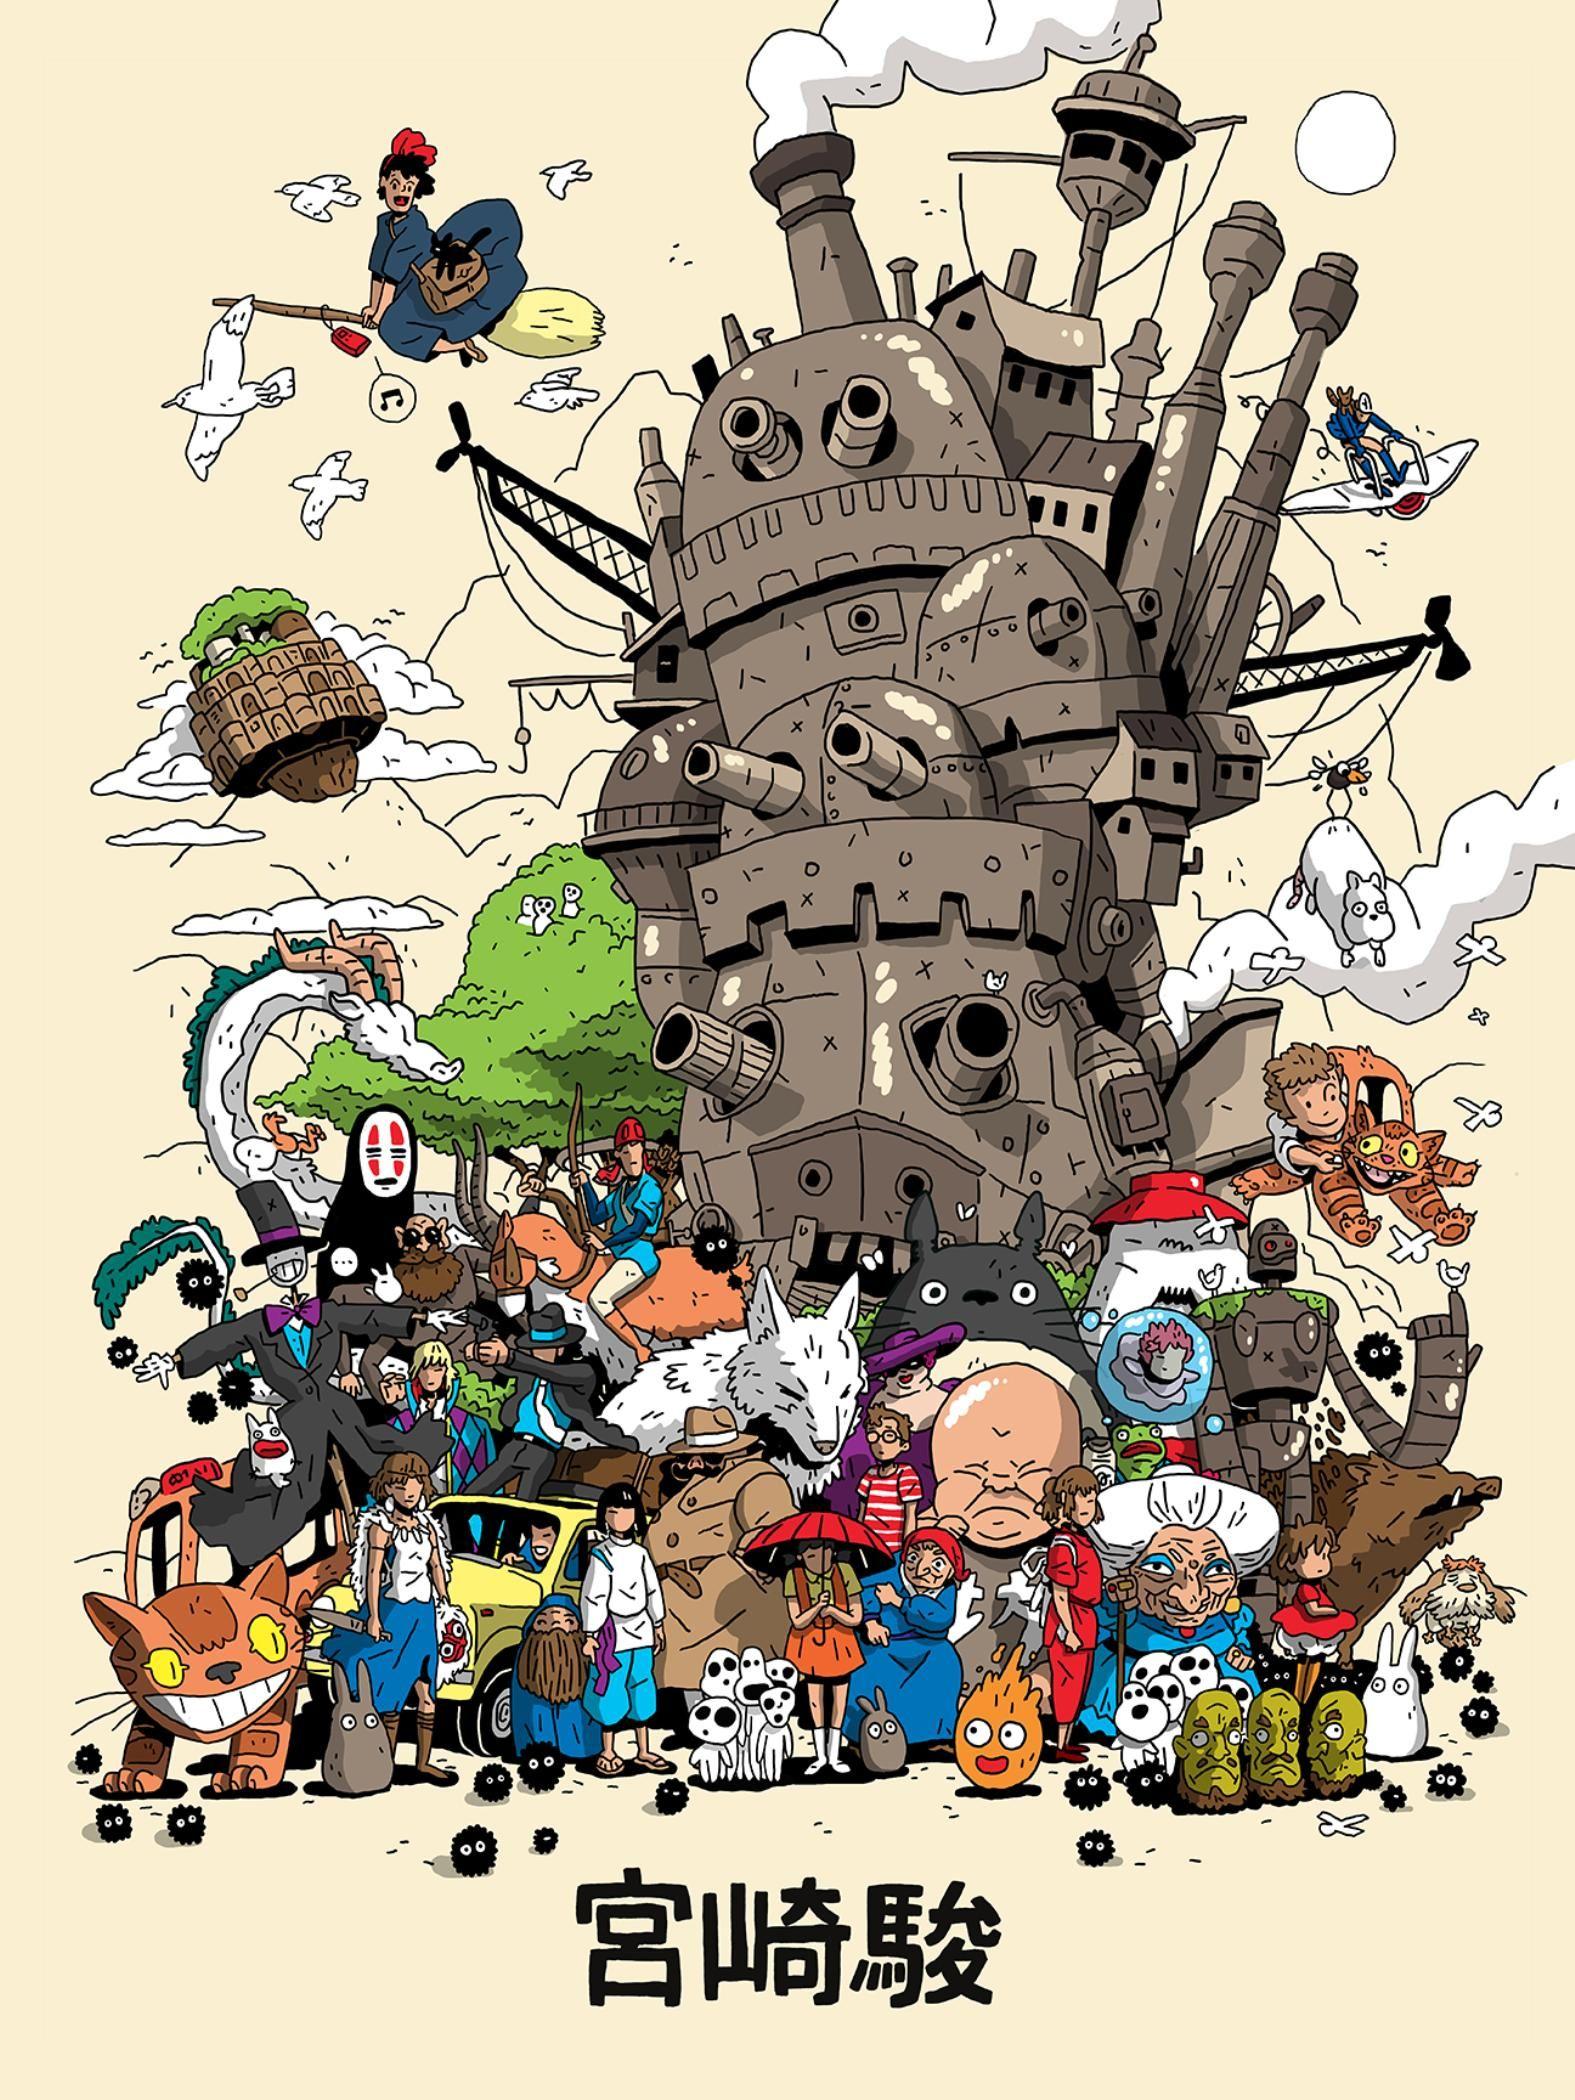 Seventy-Five Artists Honor Hayao Miyazaki in New Gallery Show